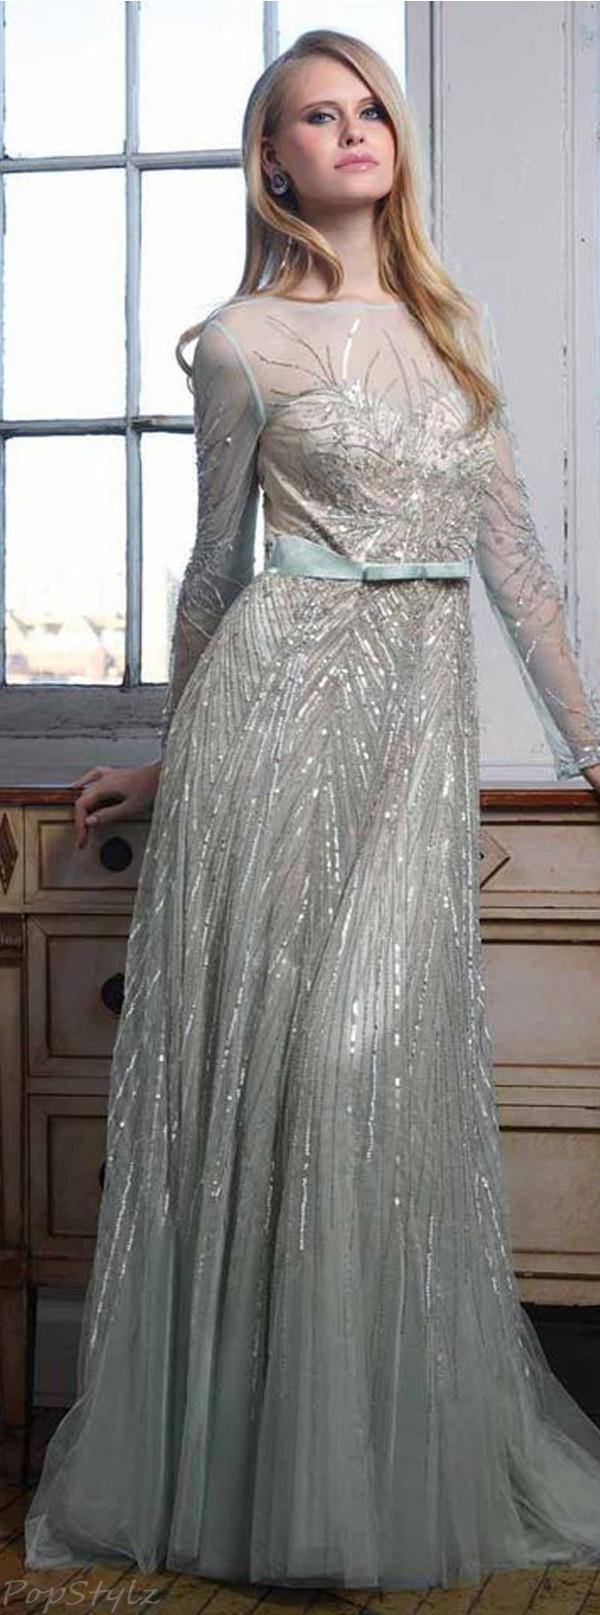 Terani Couture M1823 Formal Dress